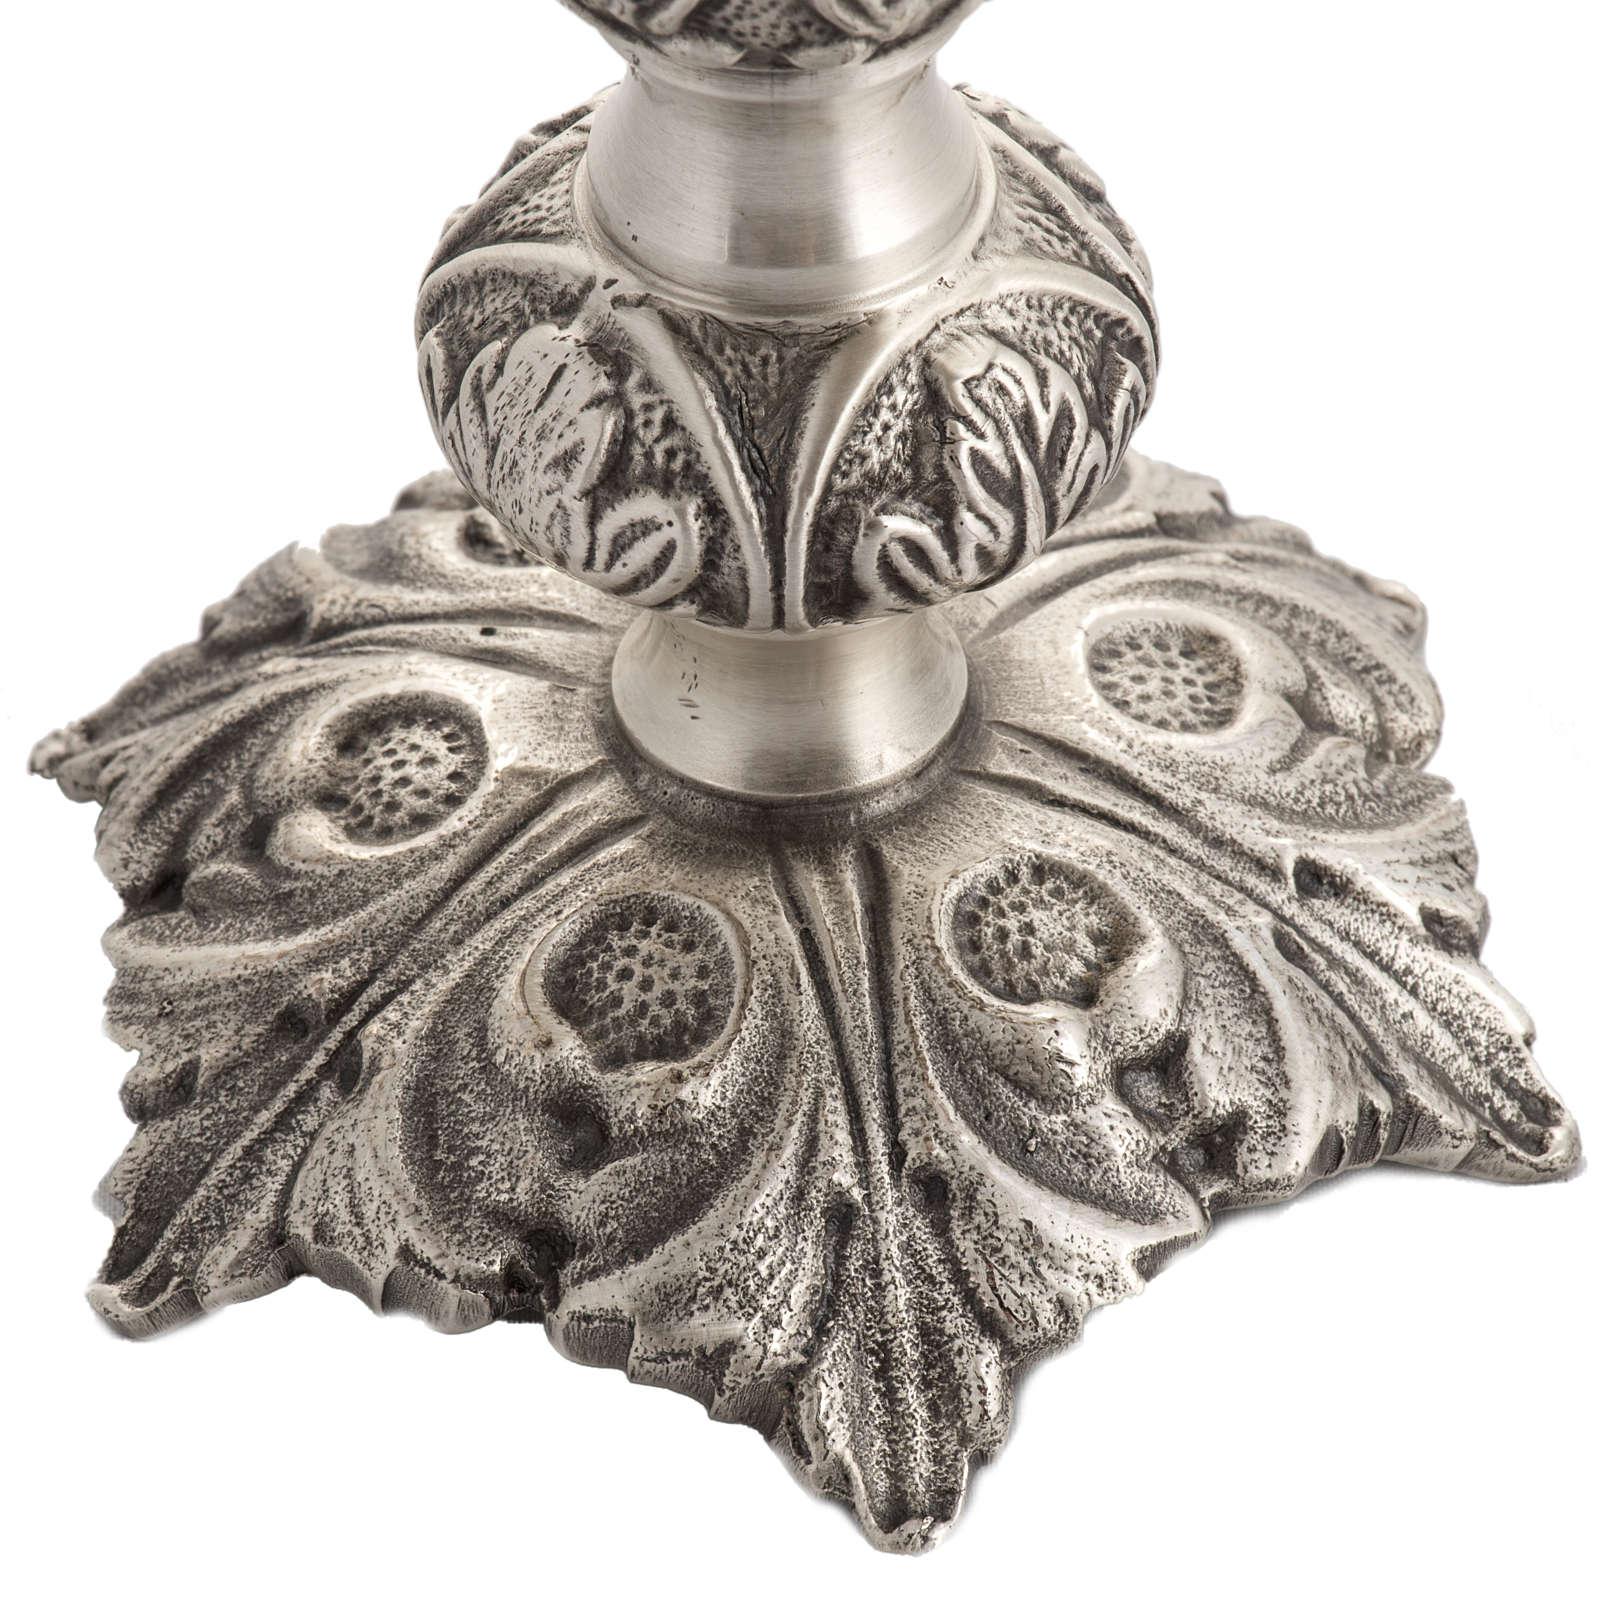 Reliquiario bronzo fuso h 27 cm 4